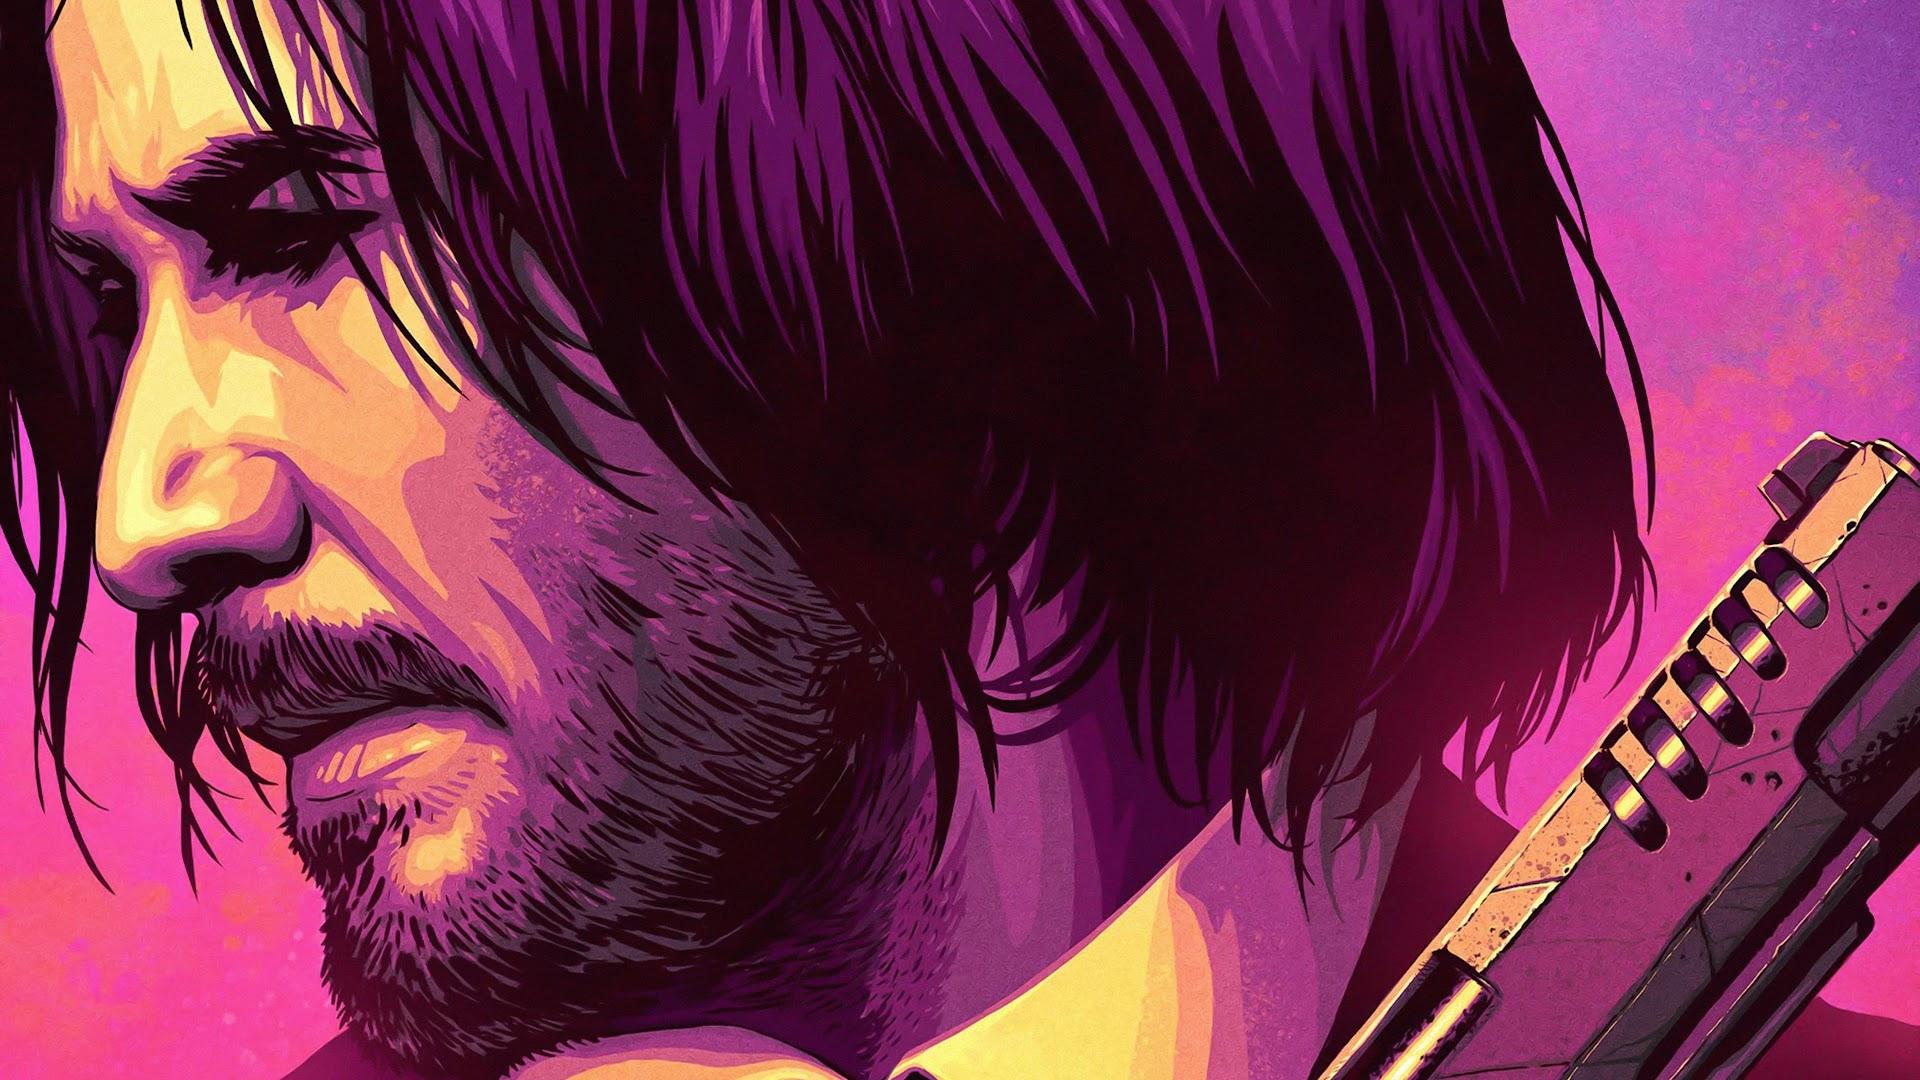 John Wick 3, Keanu Reeves, Art, 4K, #24 Wallpaper